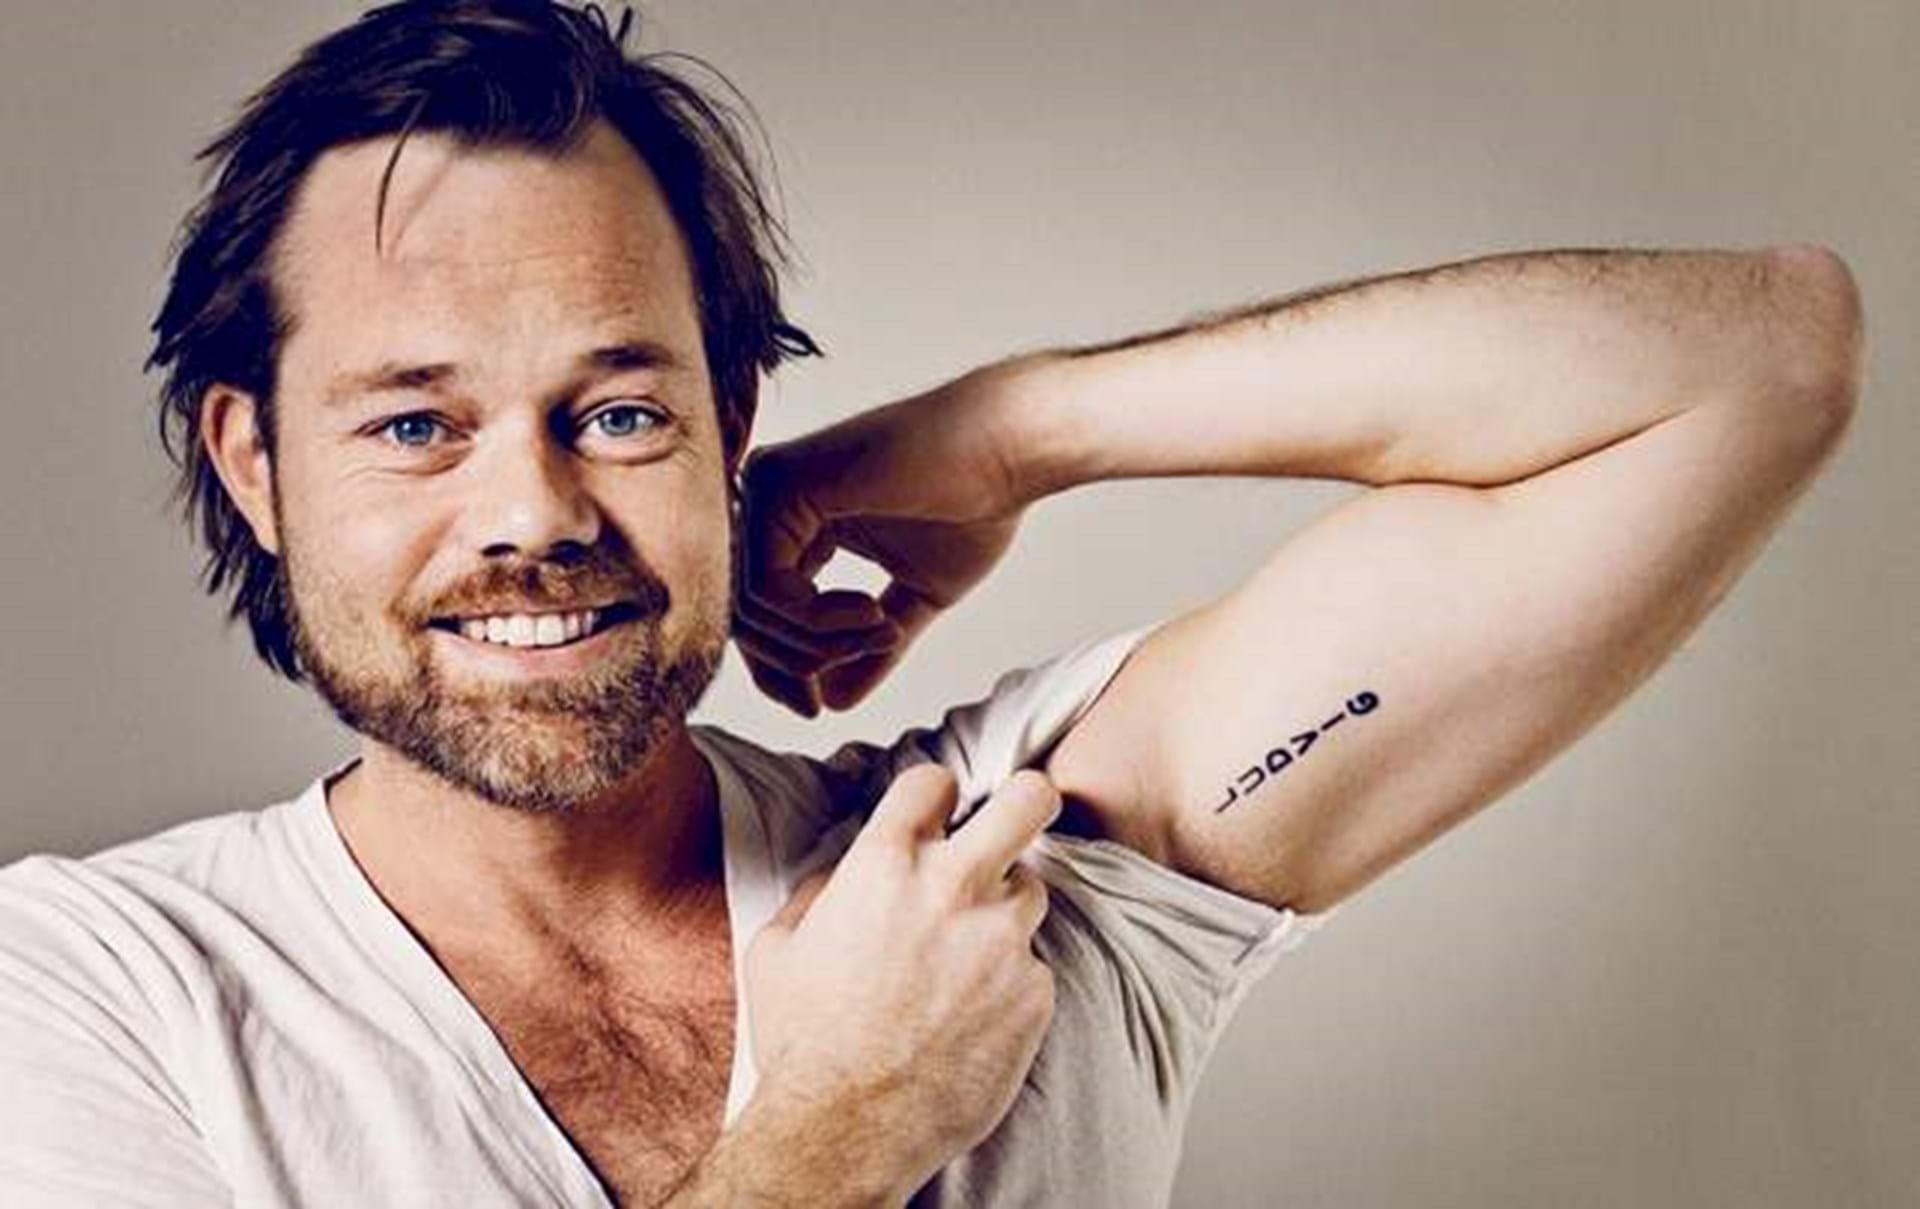 Med betydning tatoveringer Tatoveringer